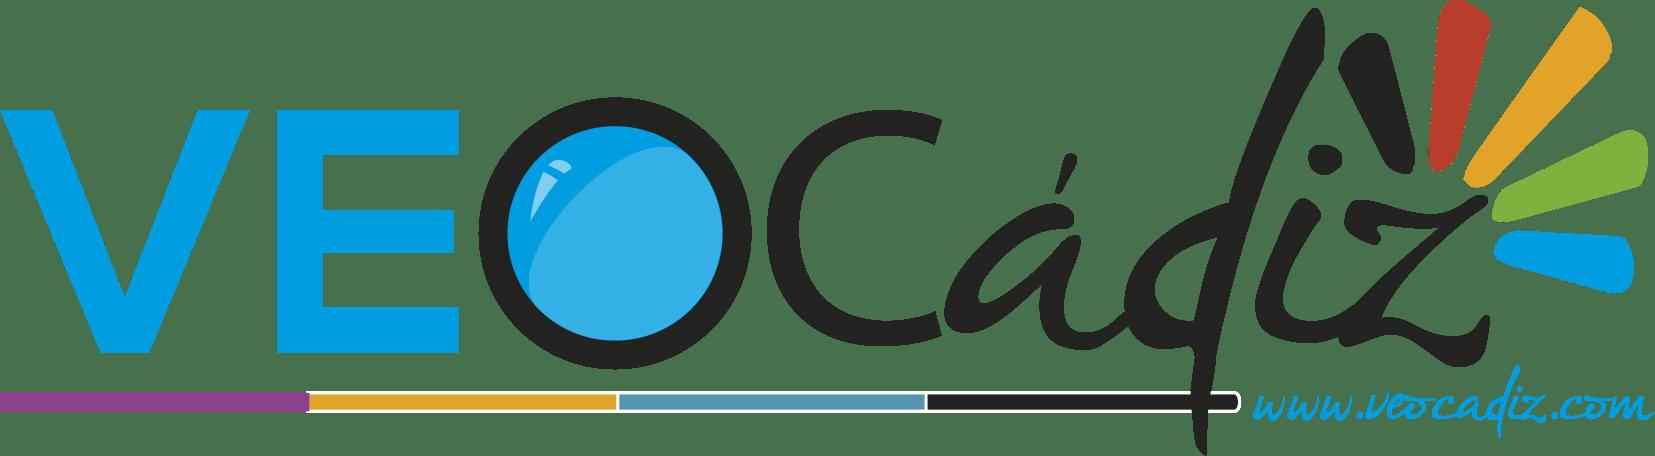 logo VEO Cadiz